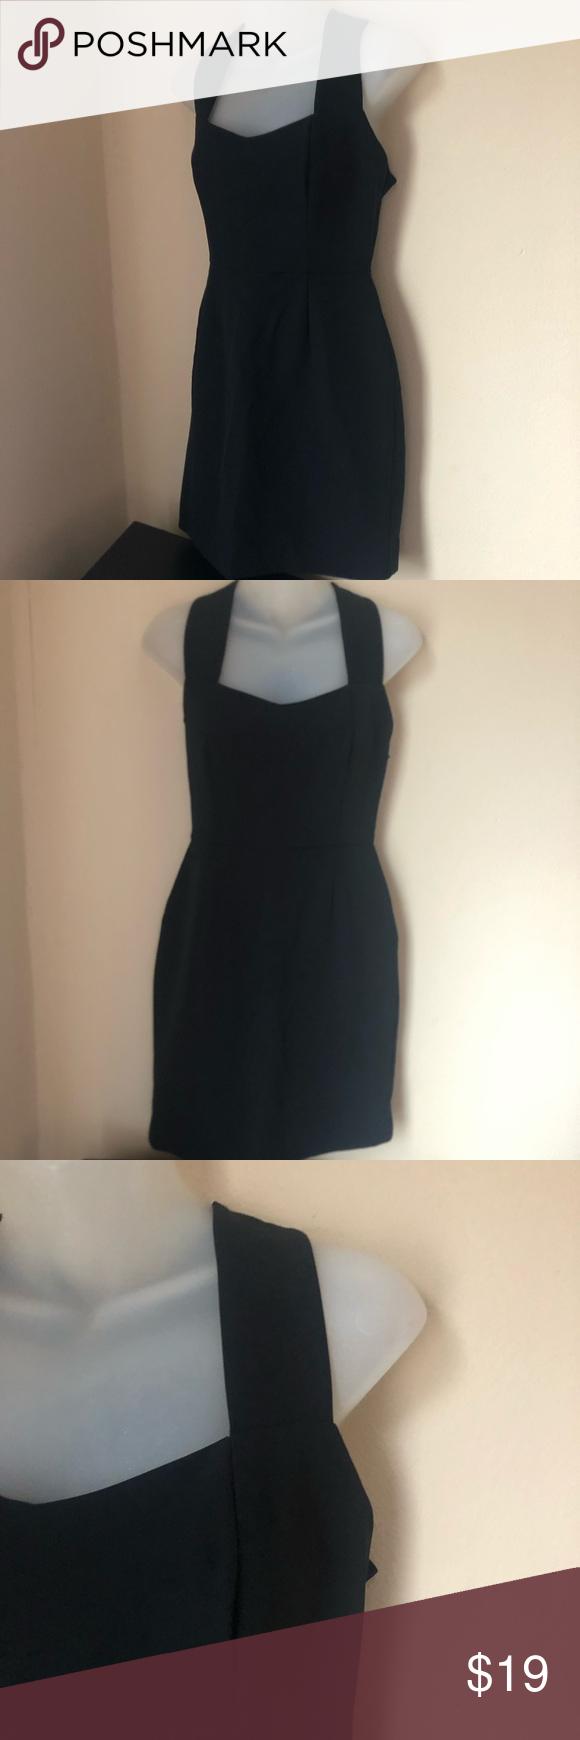 Zara Basic Little Black Dress Zipper Cross Back Clothes Design Little Black Dress Dresses [ 1740 x 580 Pixel ]